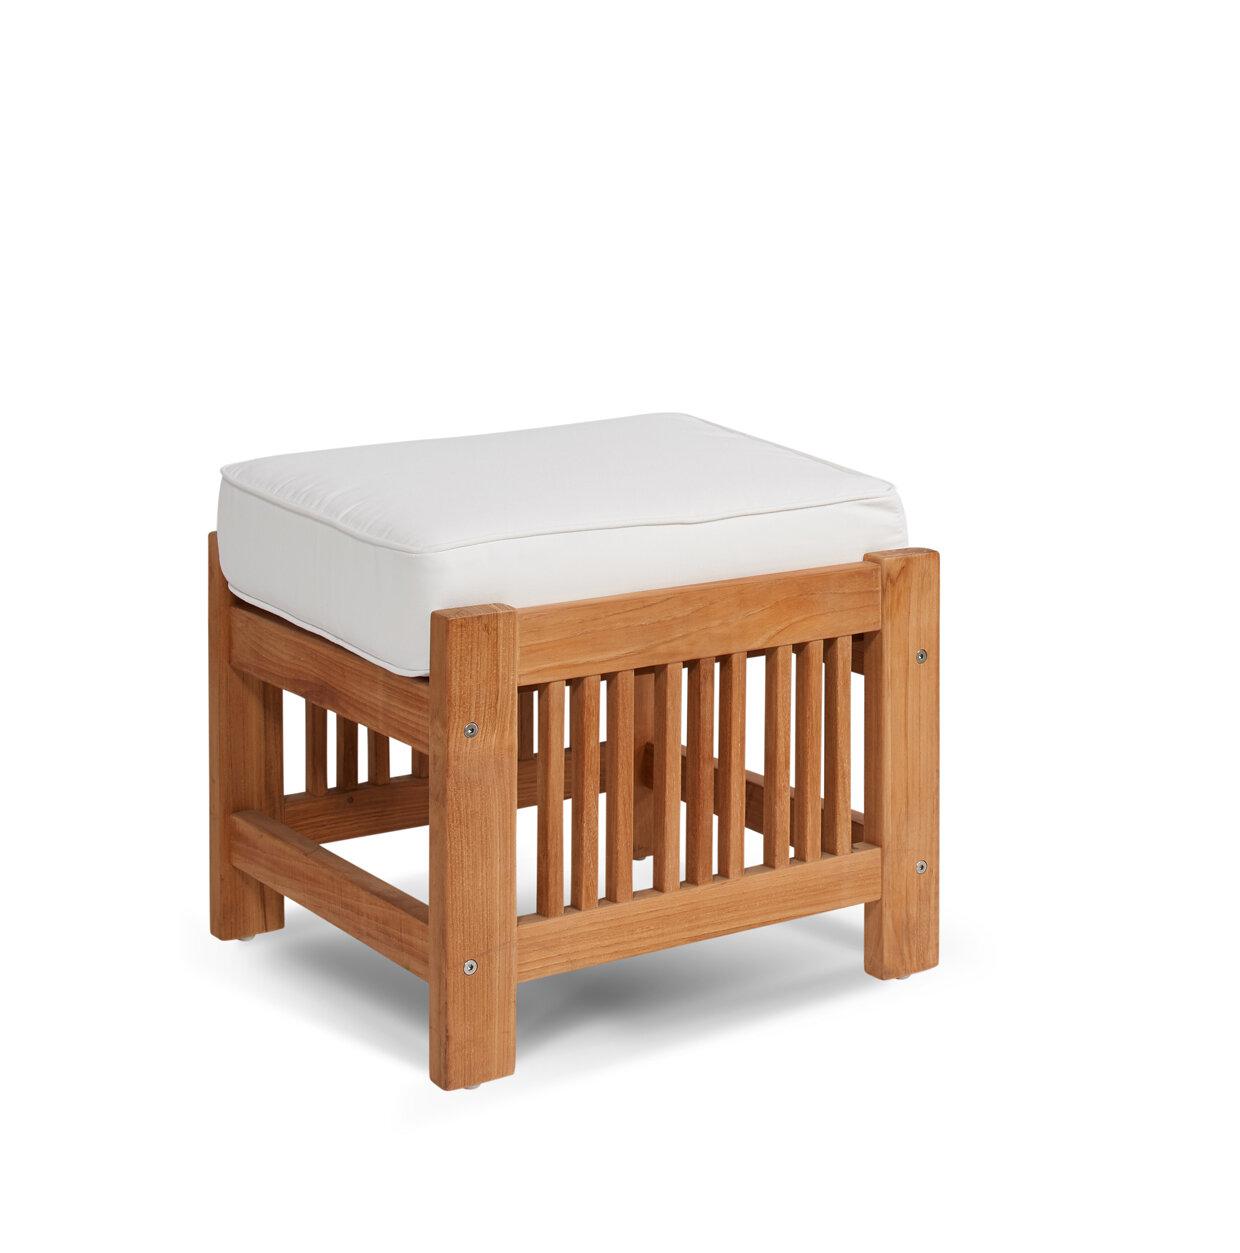 HiTeak Furniture Summer Set Outdoor Teak Ottoman With Sunbrella Cushion |  Wayfair